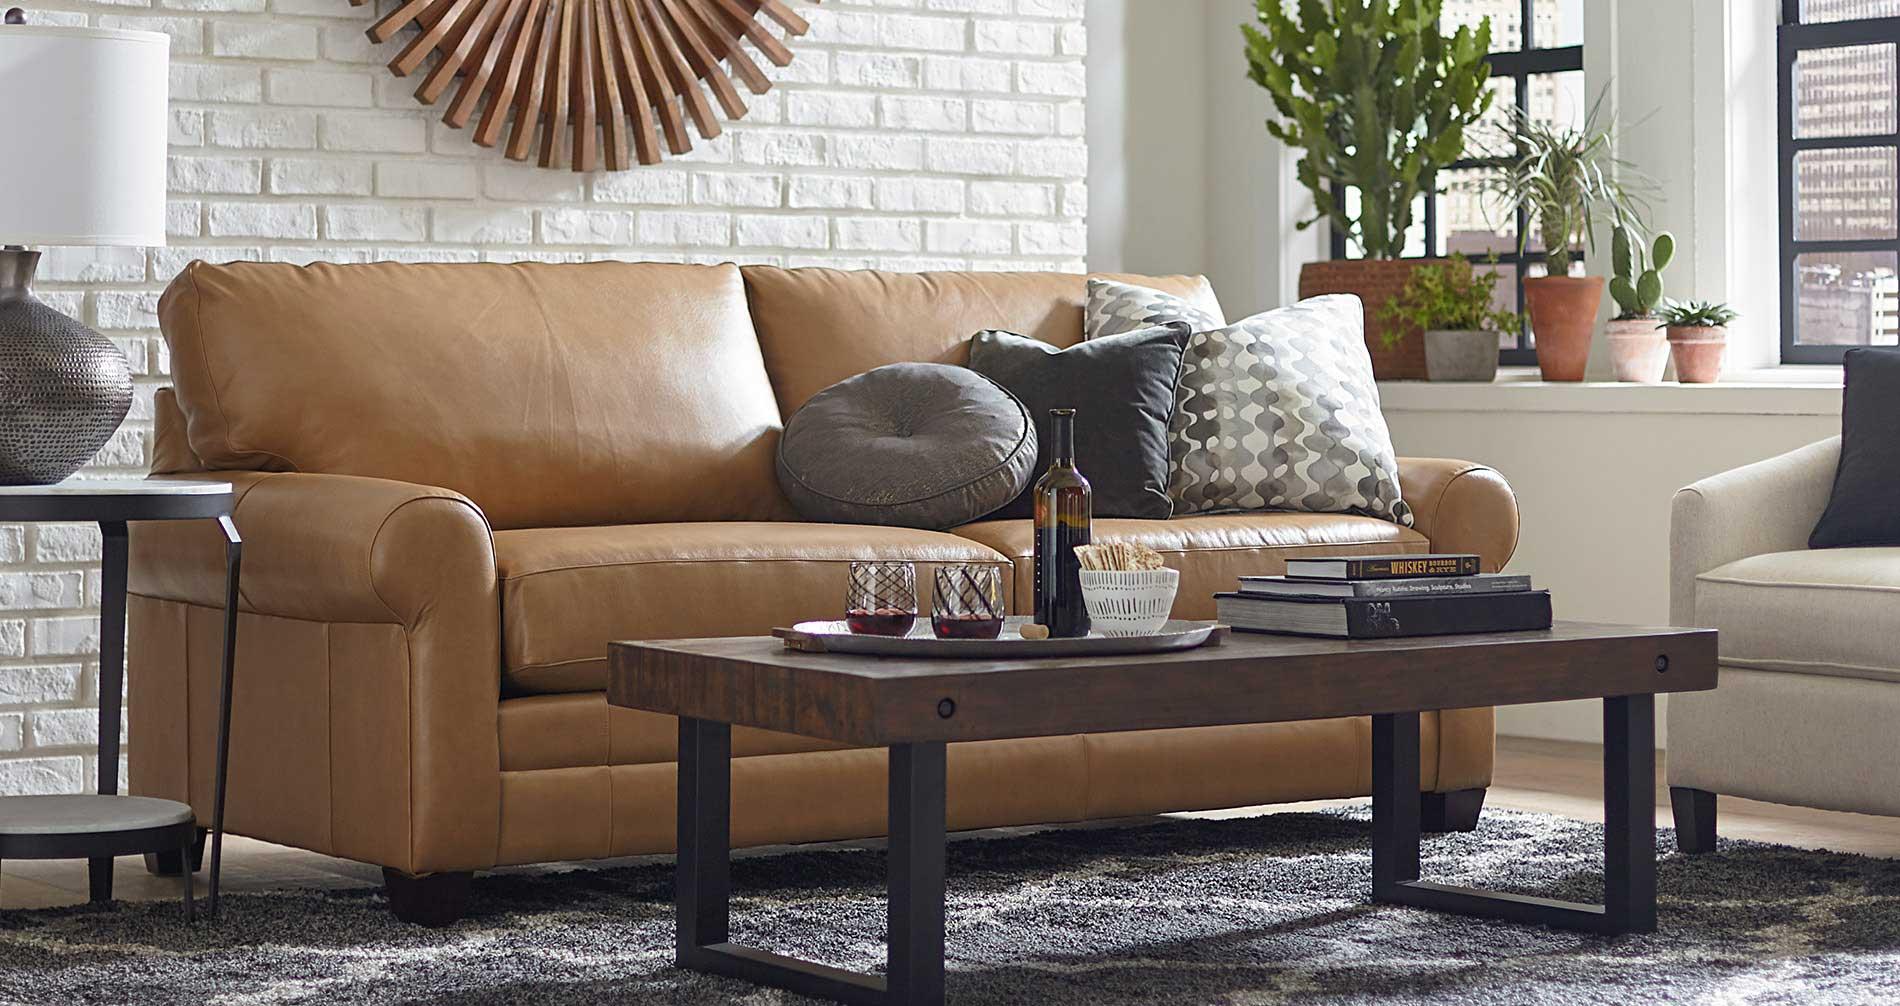 bassett furniture home decor furniture you 39 ll love. Black Bedroom Furniture Sets. Home Design Ideas